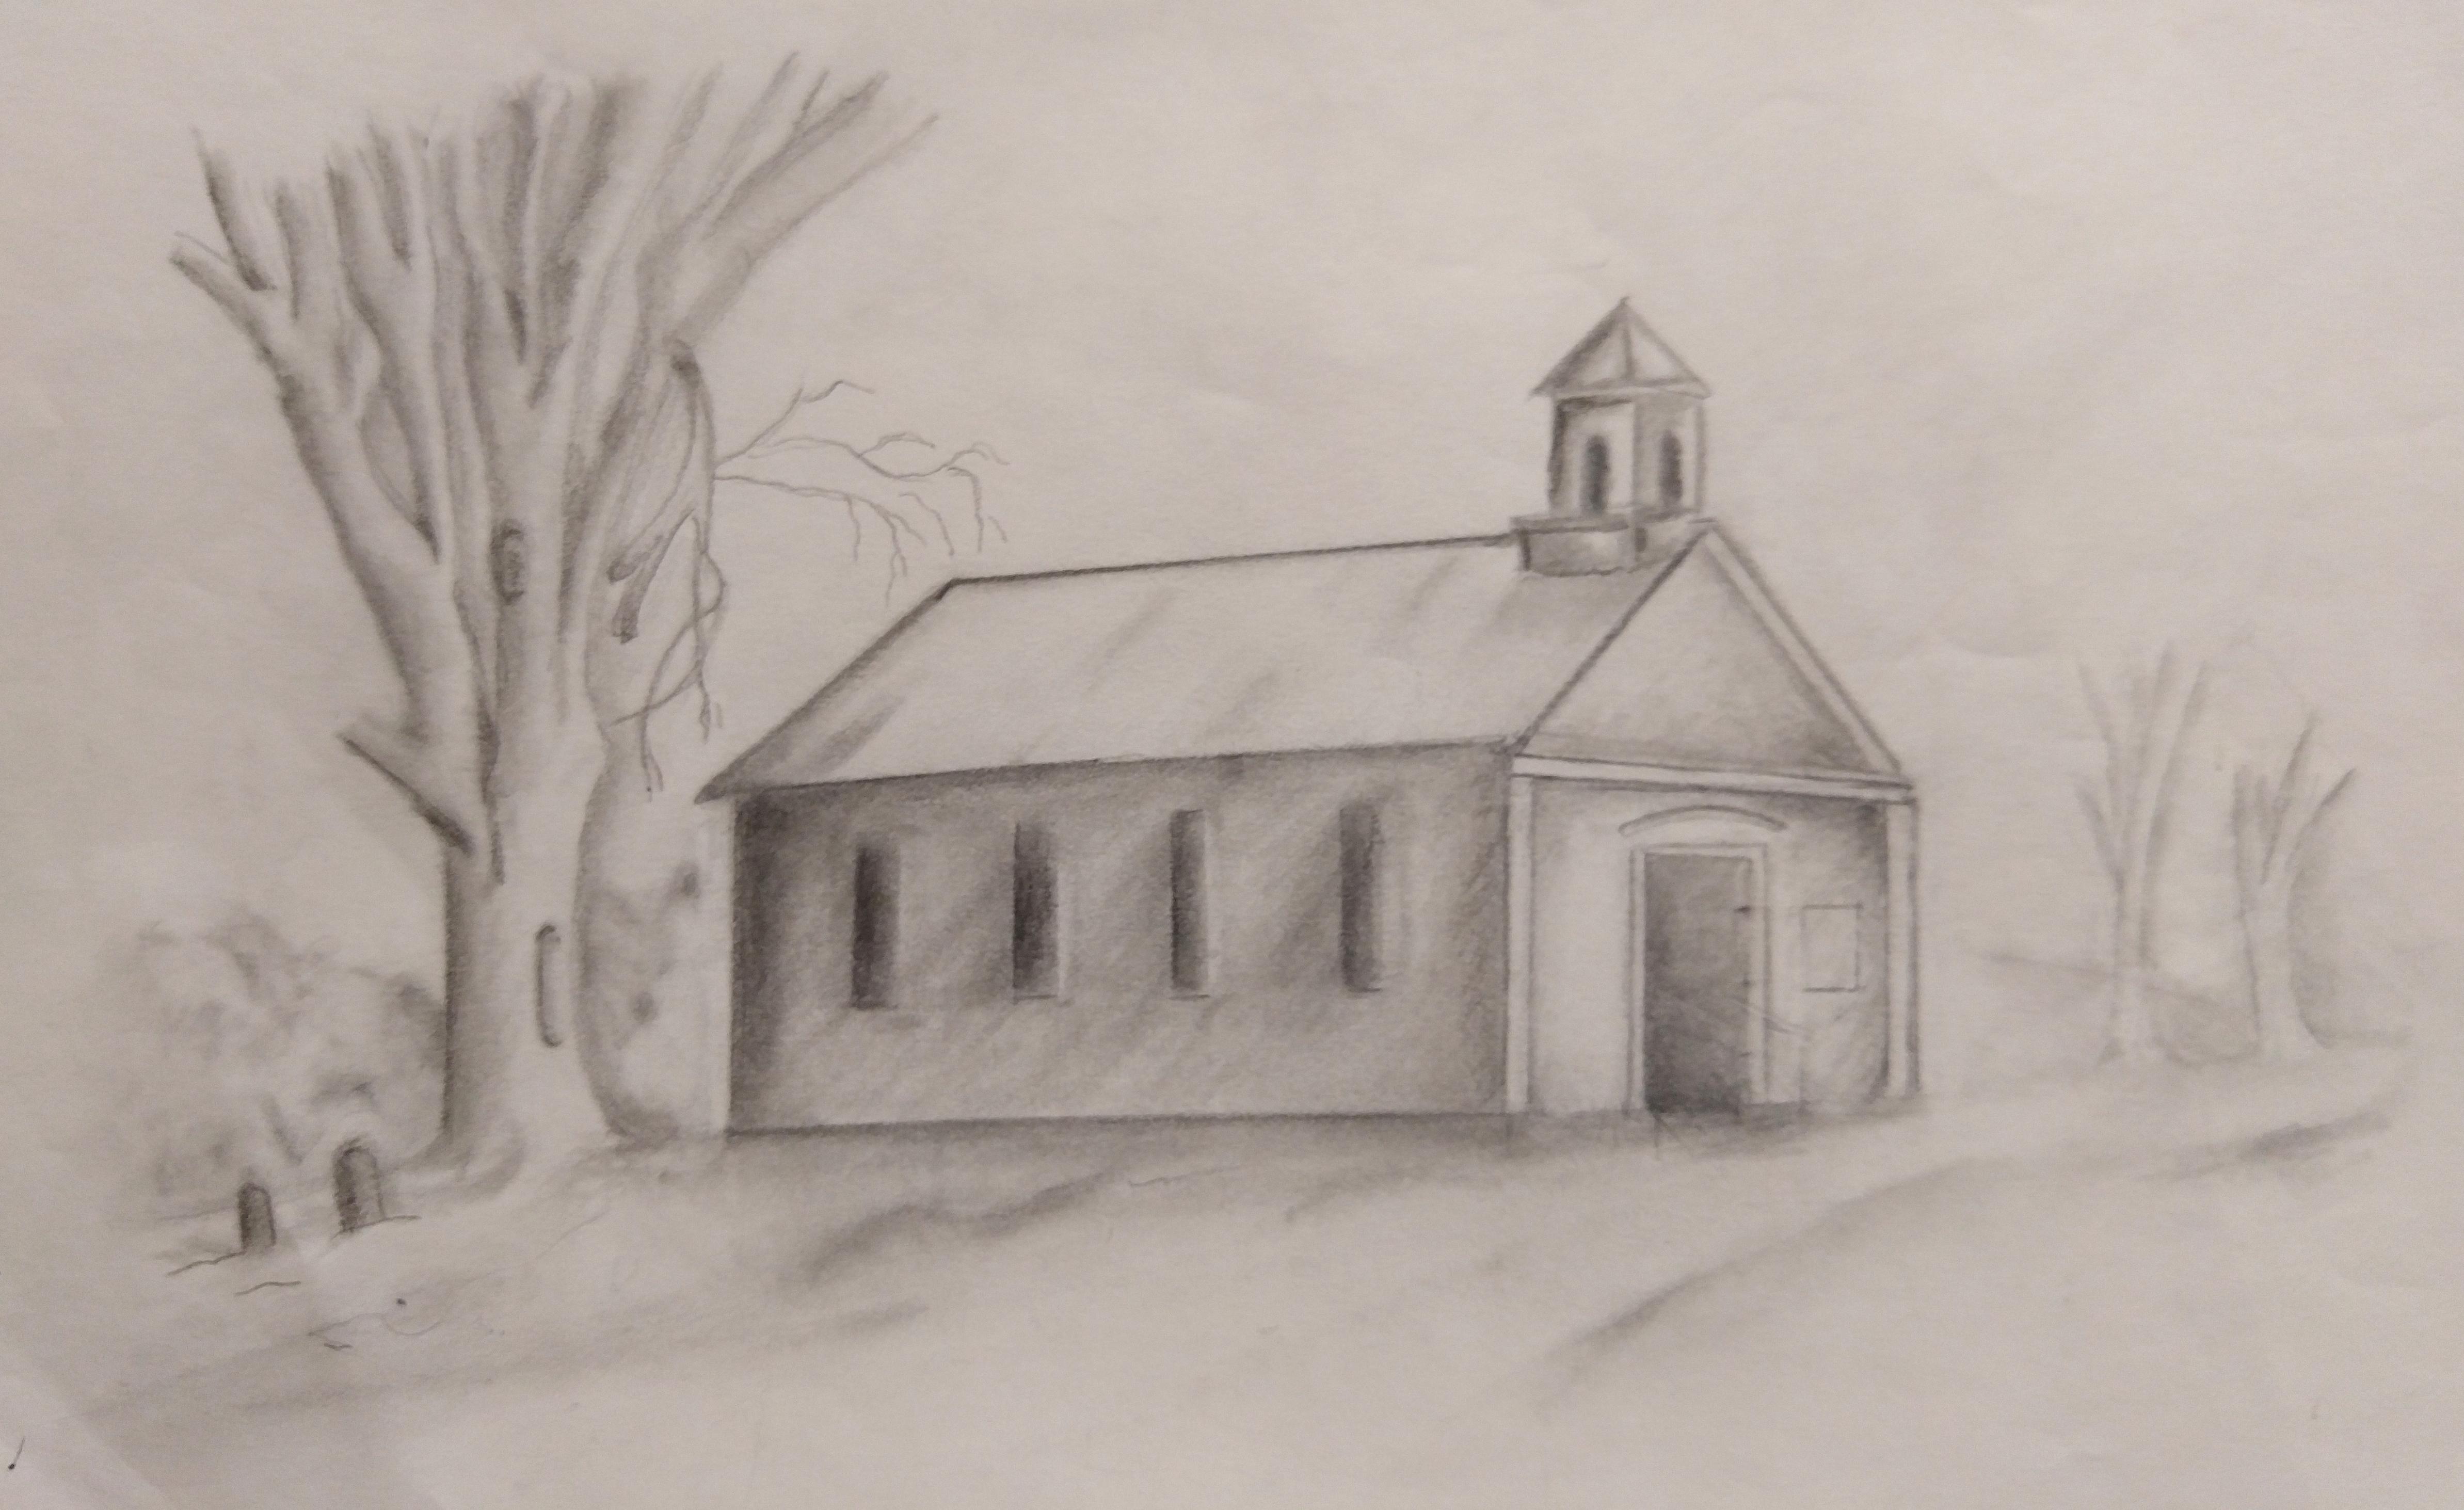 Ohio church pencil drawing